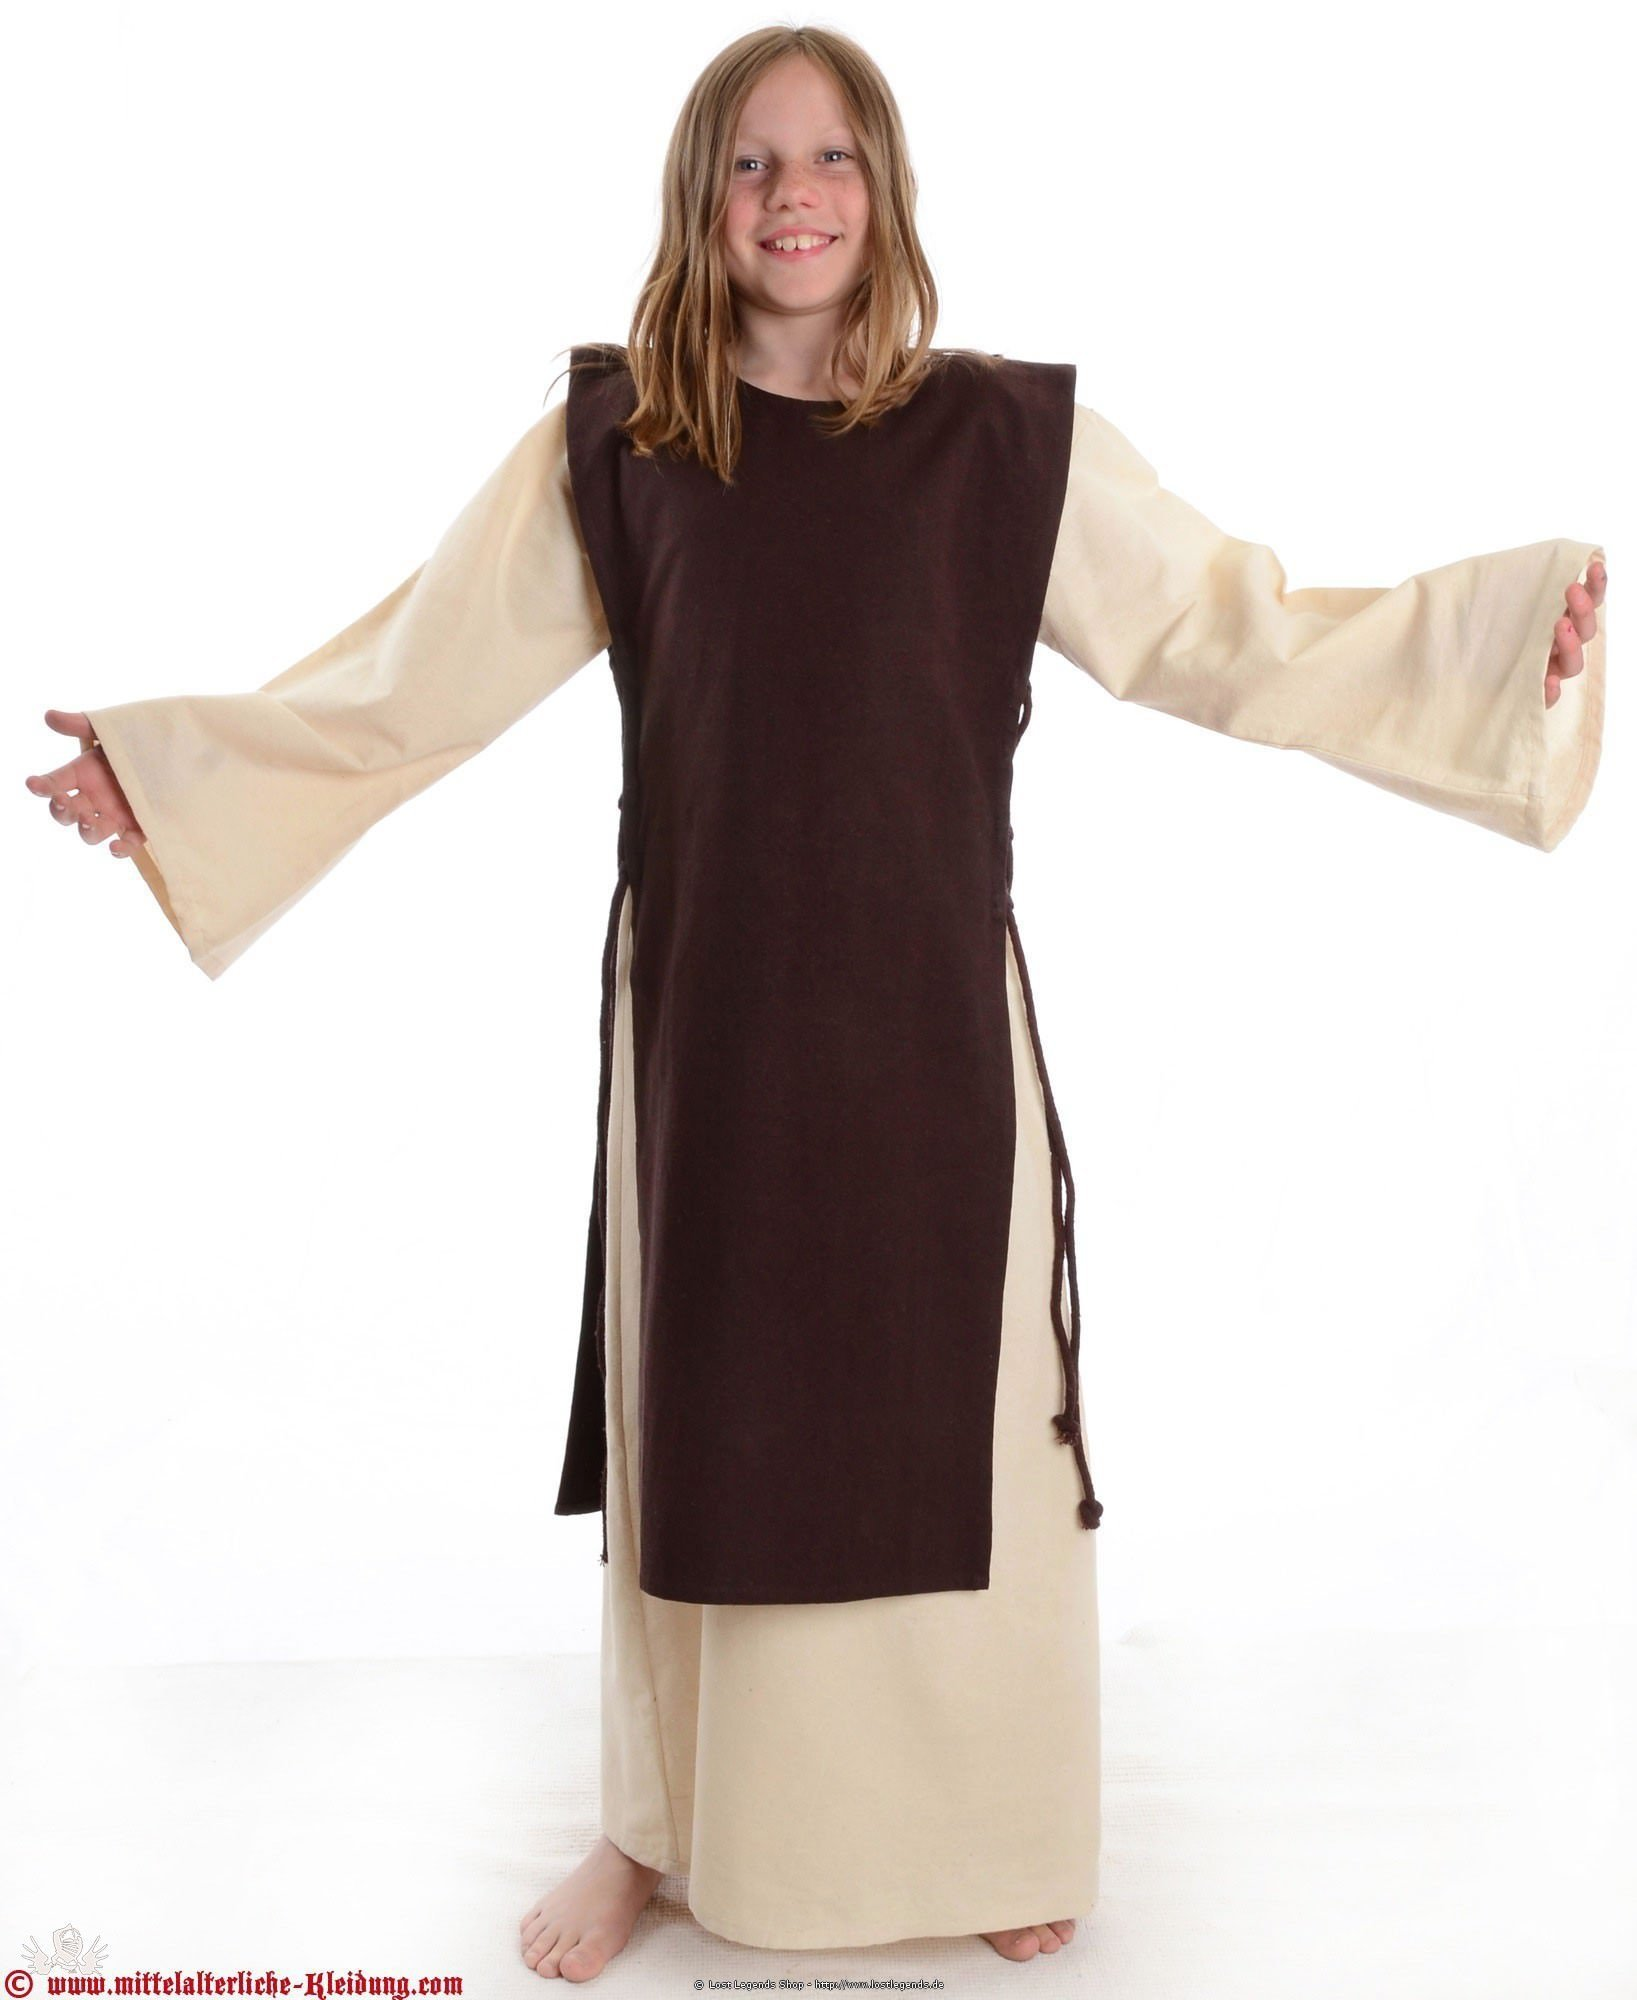 Mittelalter Kinderkleid Alyze